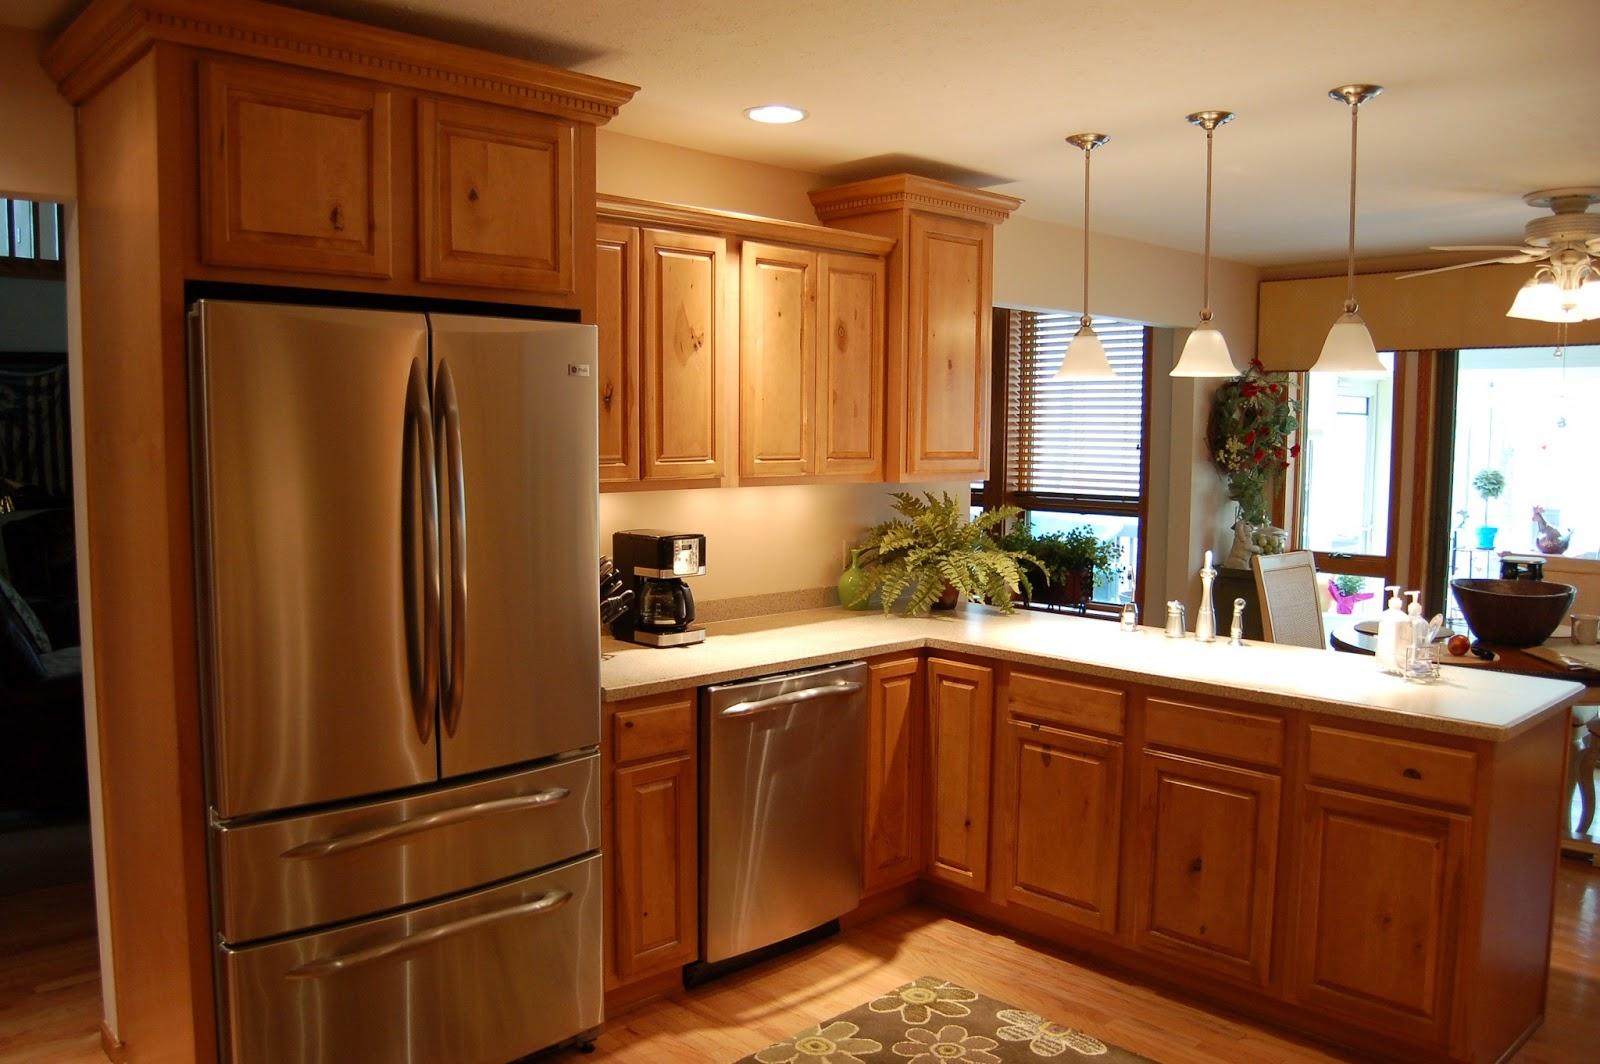 kitchen cabinets renovation ideas photo - 5